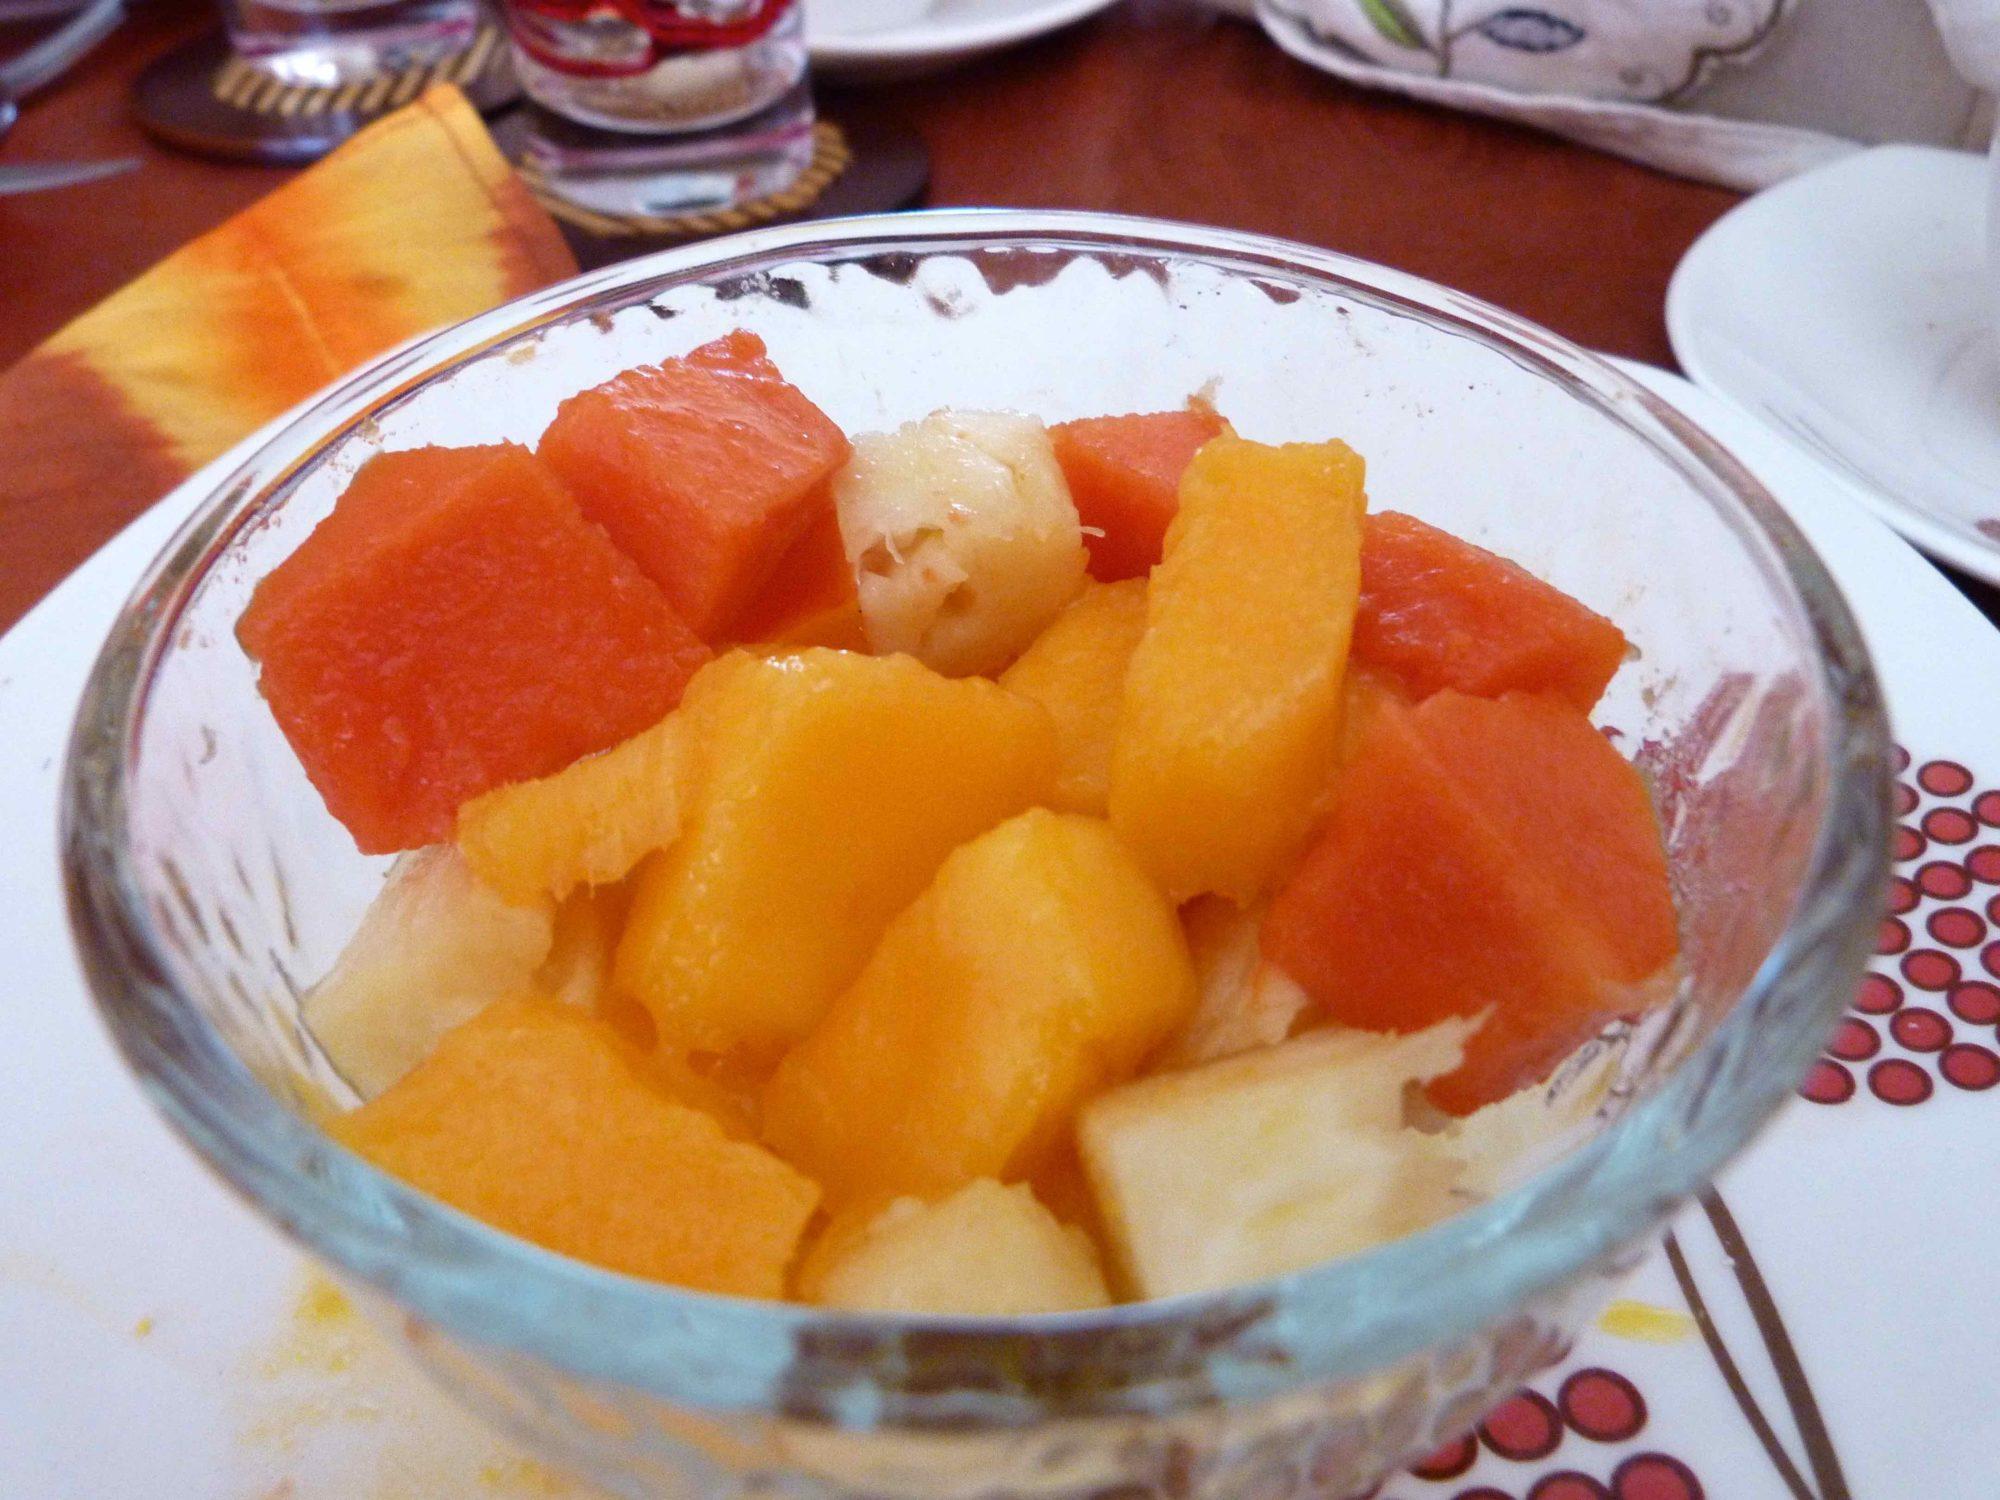 Ensalata de frutas